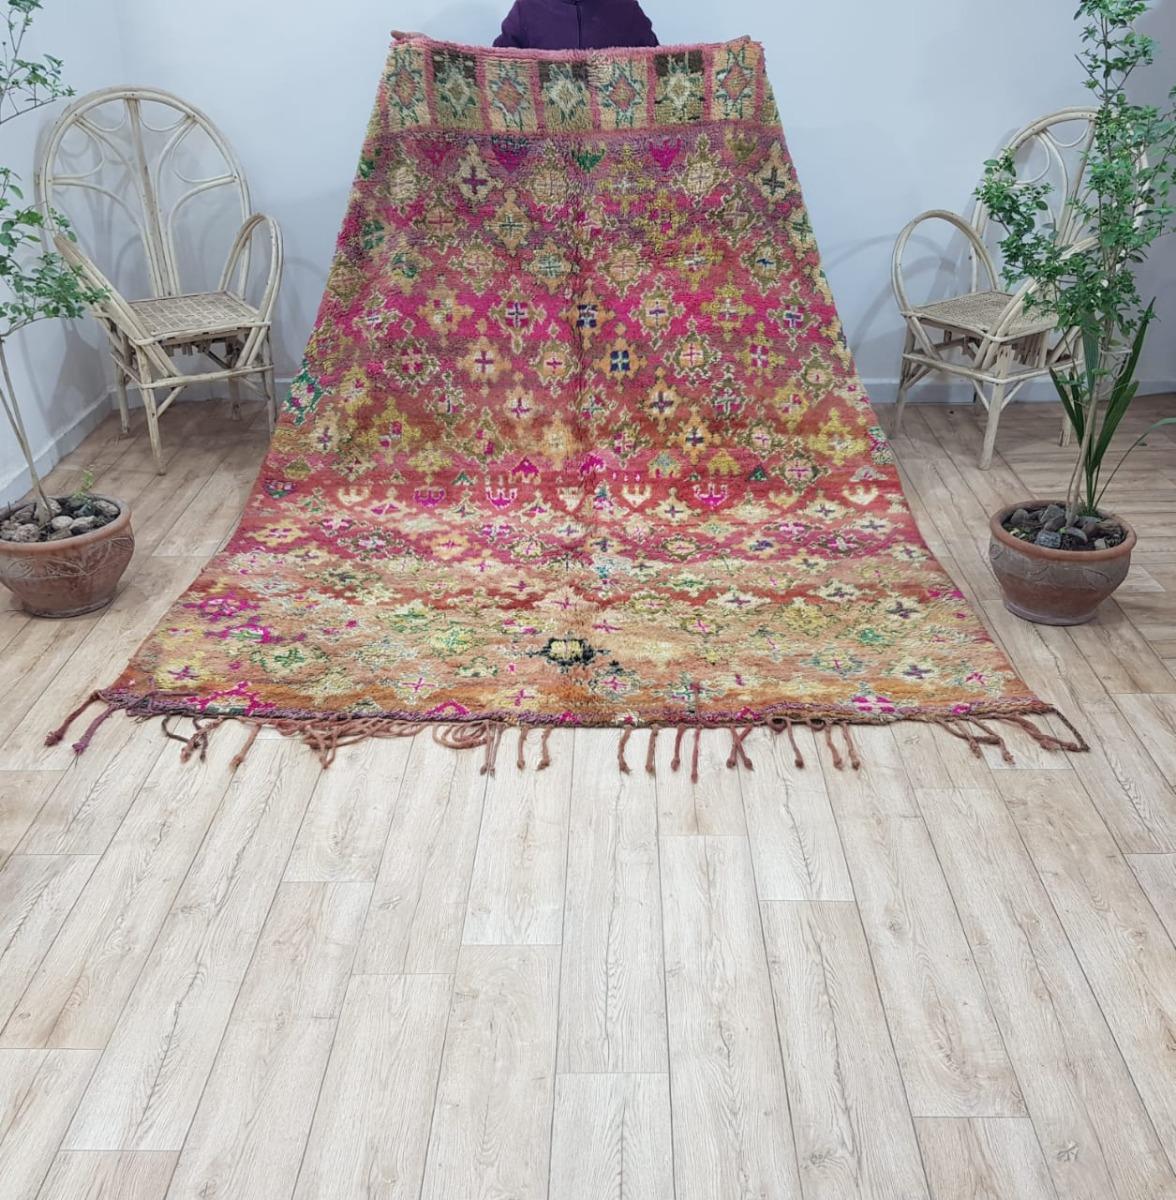 Beni mguild vloerkleed uit Marokko 61012 van 250cm x 190cm